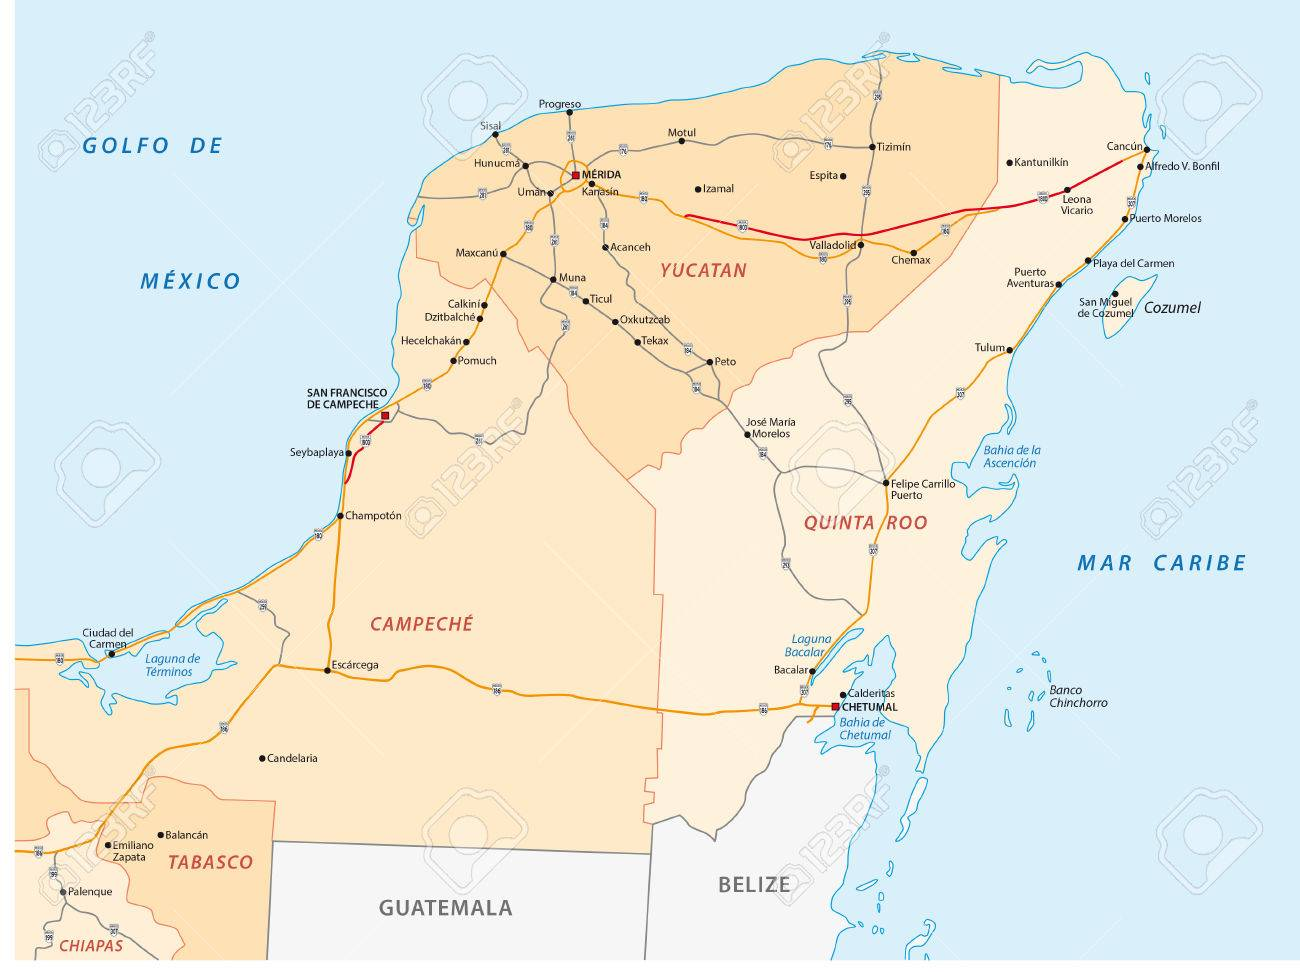 Yucatan peninsula road map on zacatecas map, oaxaca map, pampas map, mahahual map, baja map, cozumel map, cancun map, belize map, merida map, quintana roo map, mexico map, riviera maya map, tenochtitlan map, puerto rico map, chiapas map, hawaii map, campeche map, mesoamerica map, panama map, guadalajara map,